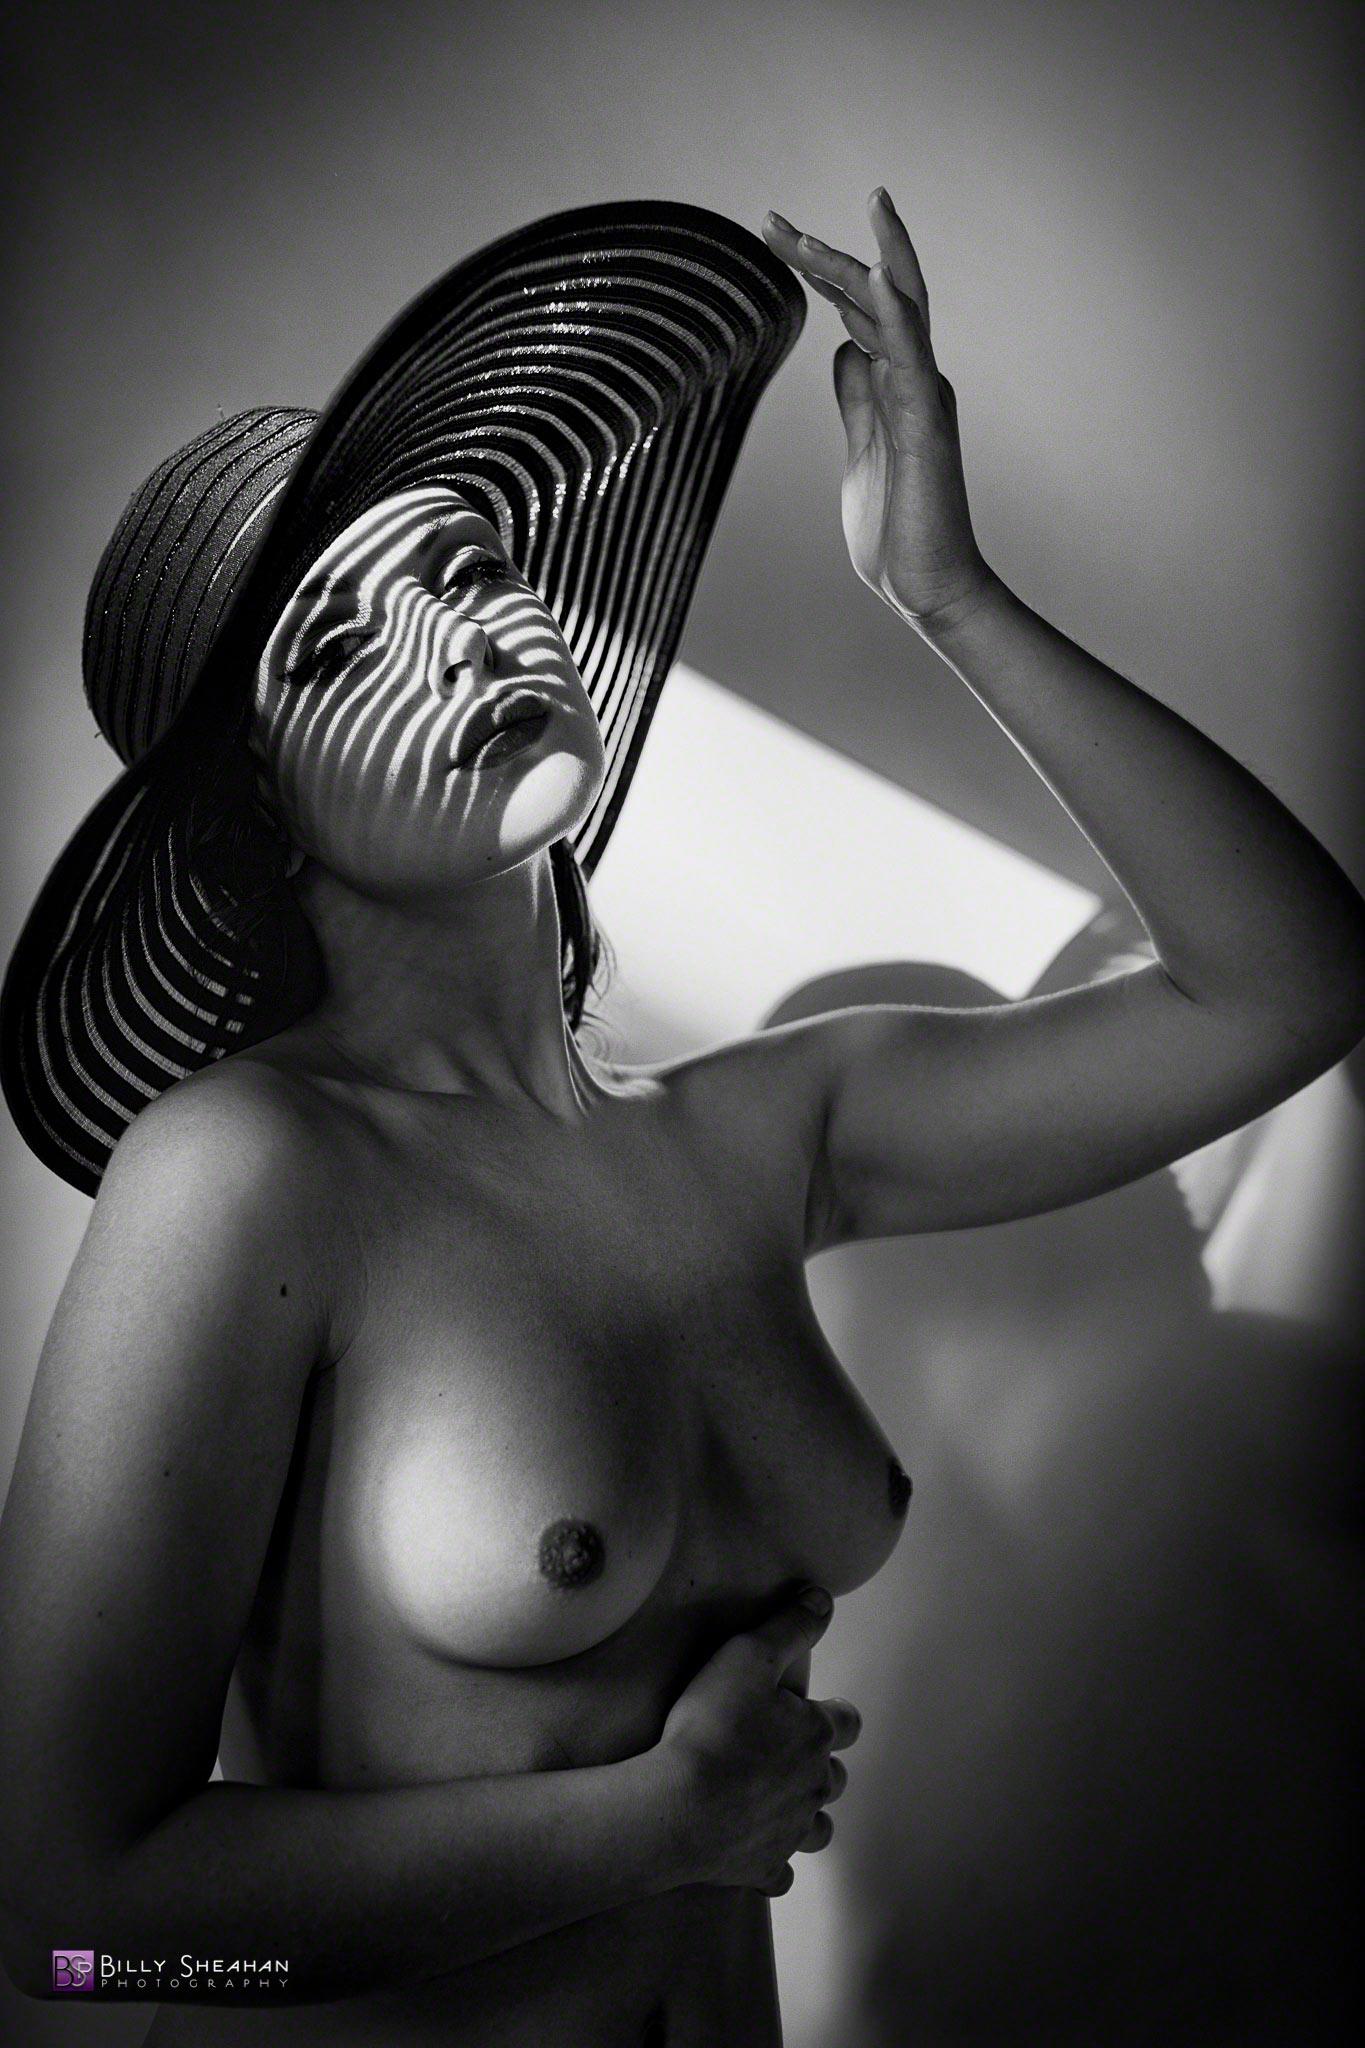 Anastasia Arteyeva in Wide Brimmed Hat © 2014 Billy Sheahan